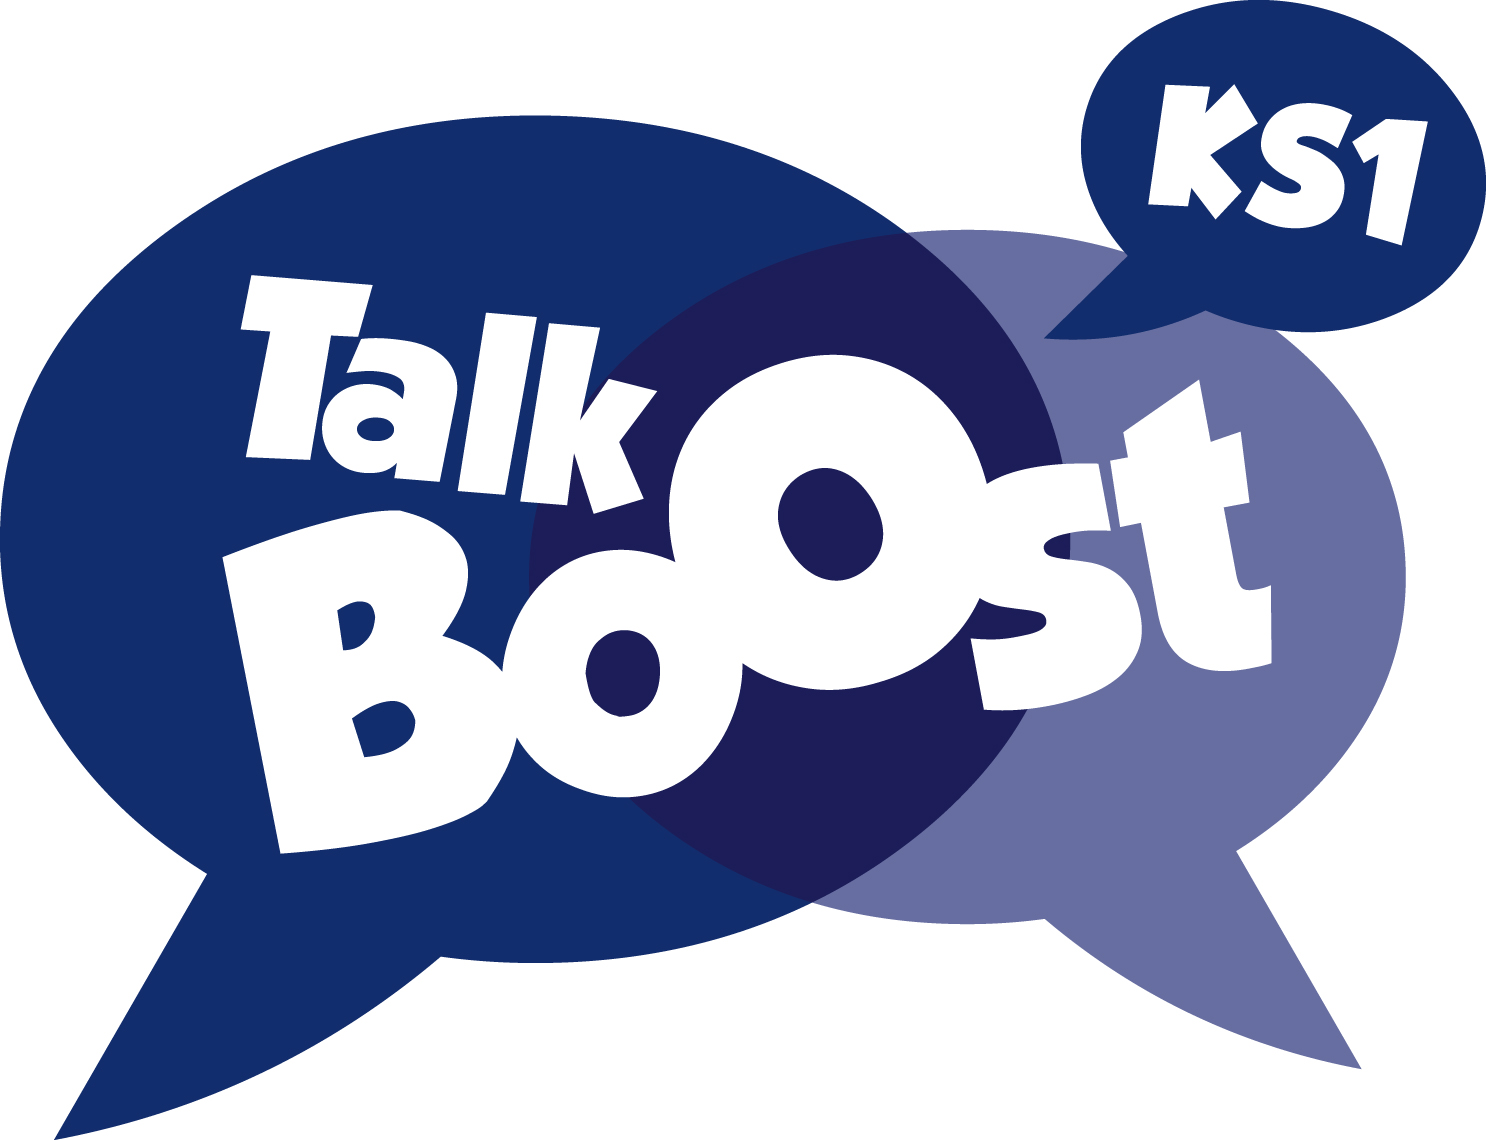 TBKS1_logo.jpg